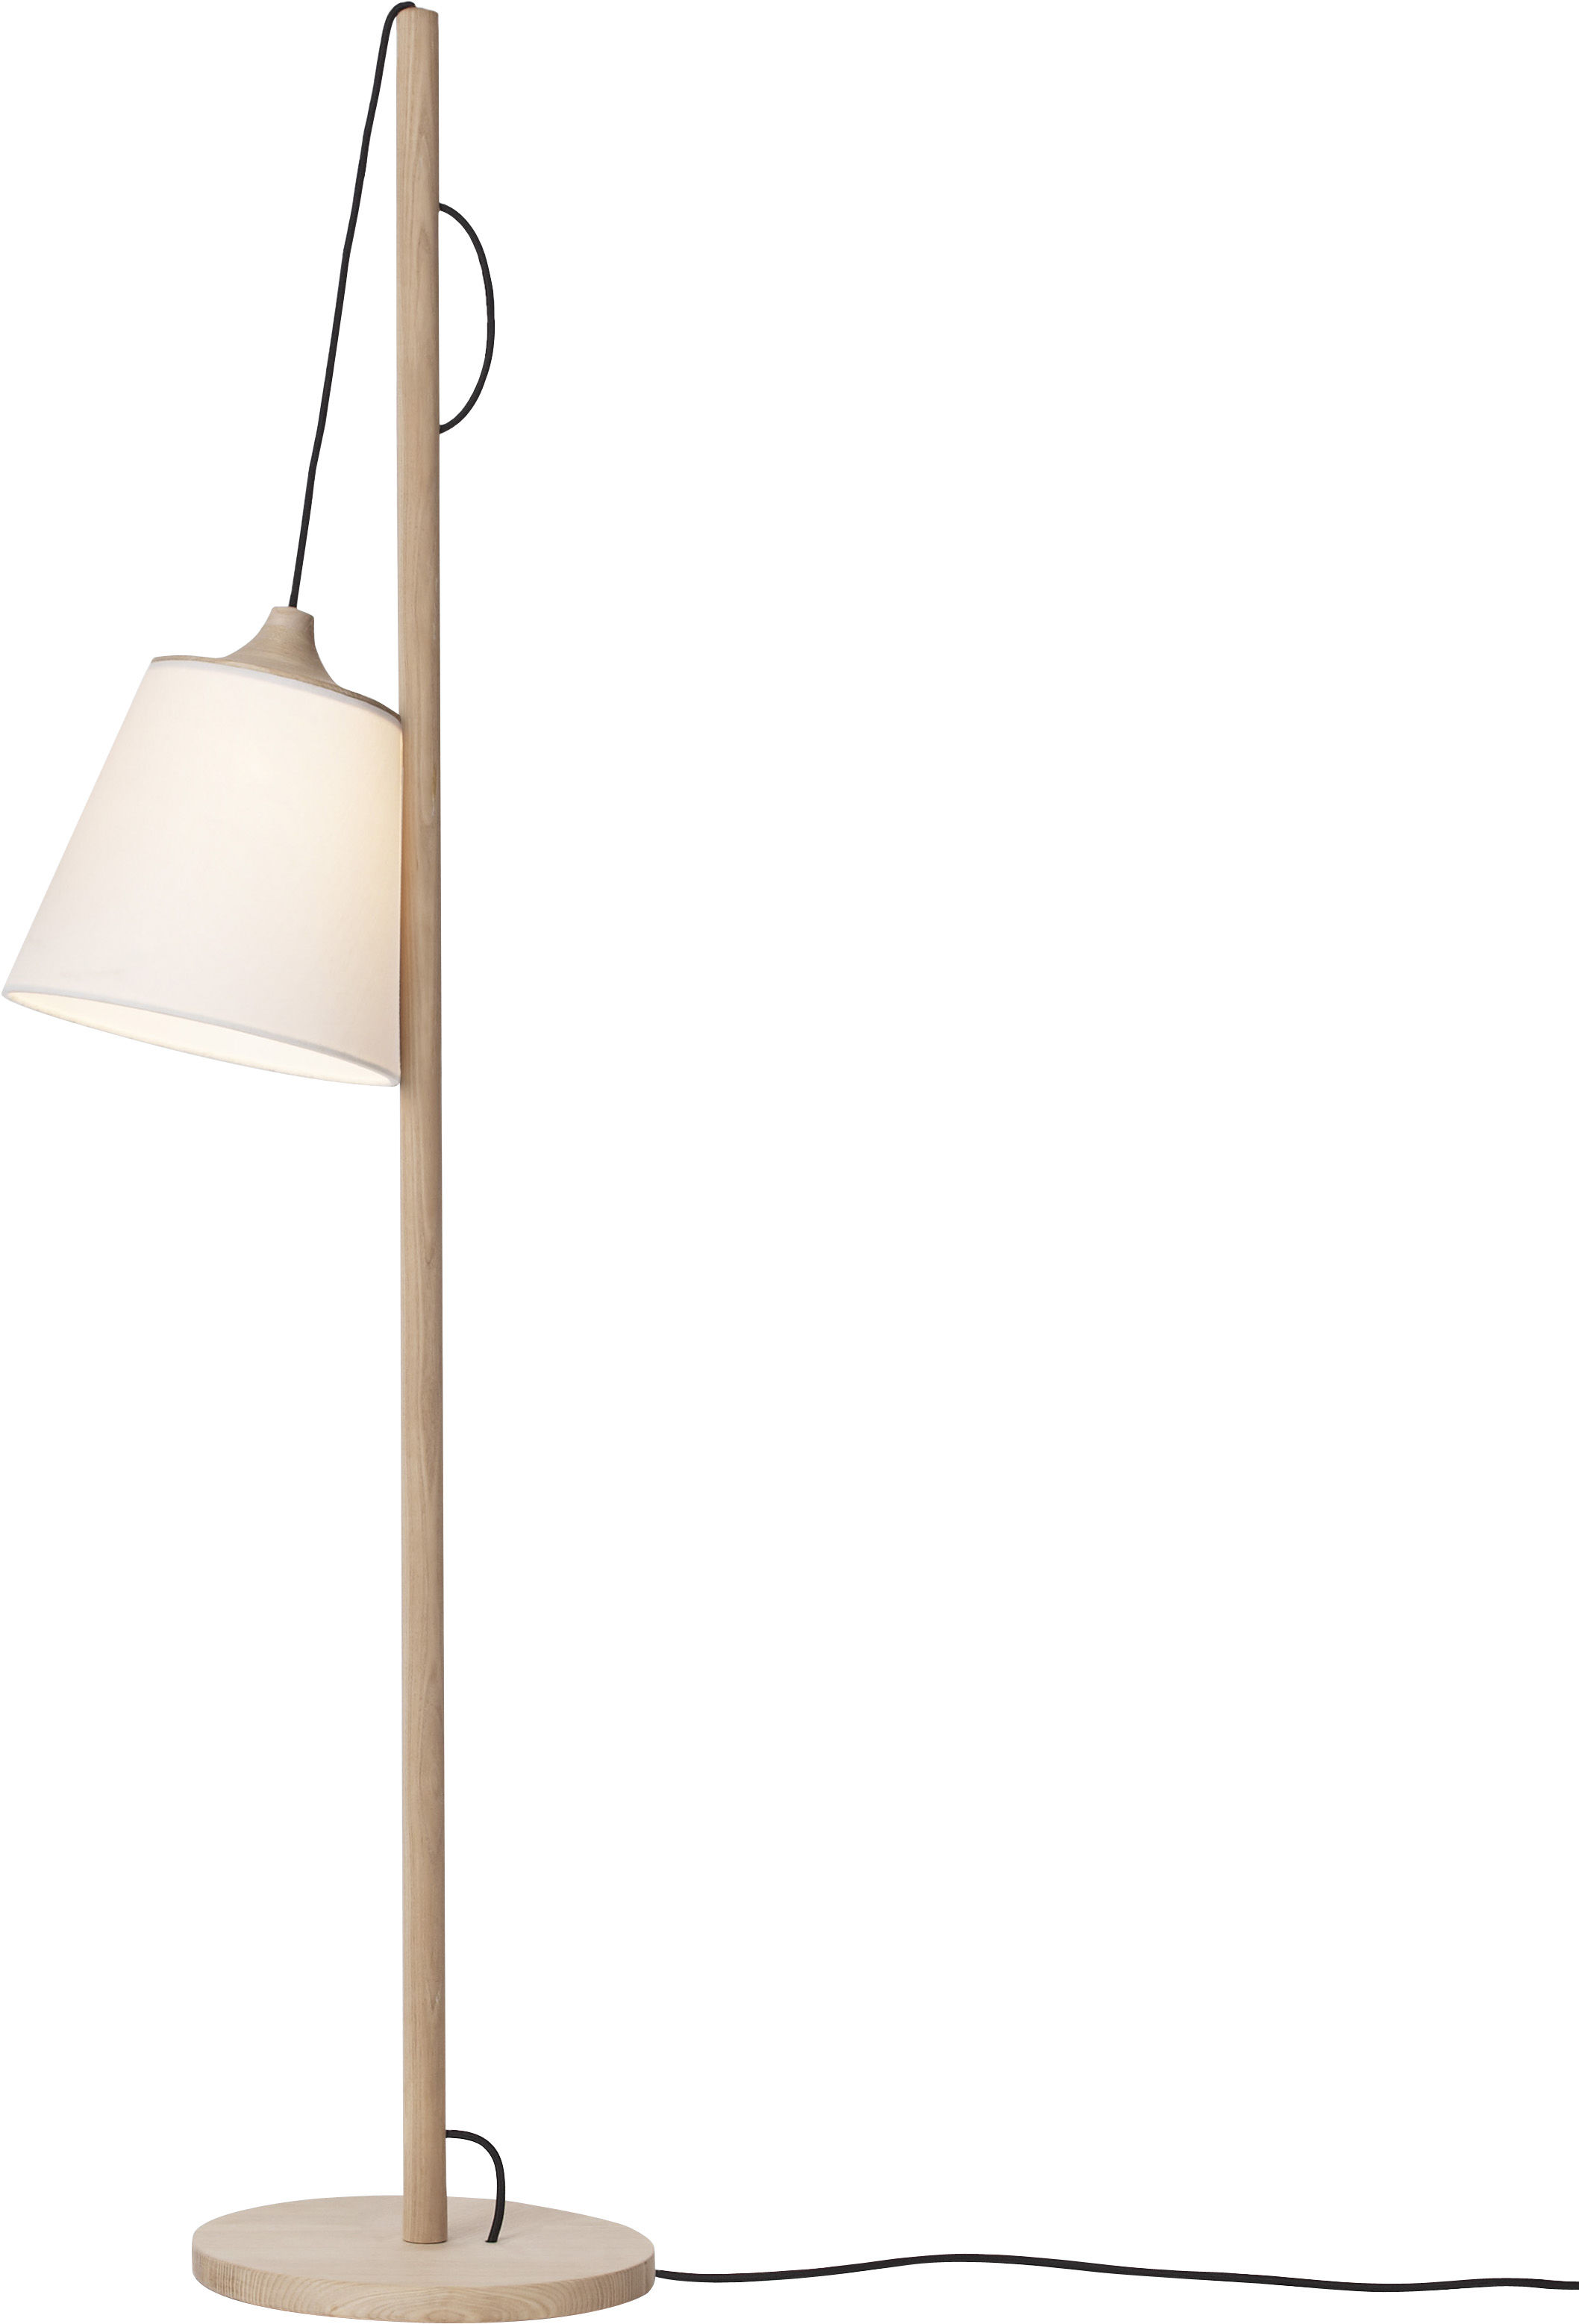 Lampadaire Pull Lamp Bois Clair Abat Jour Blanc Muuto